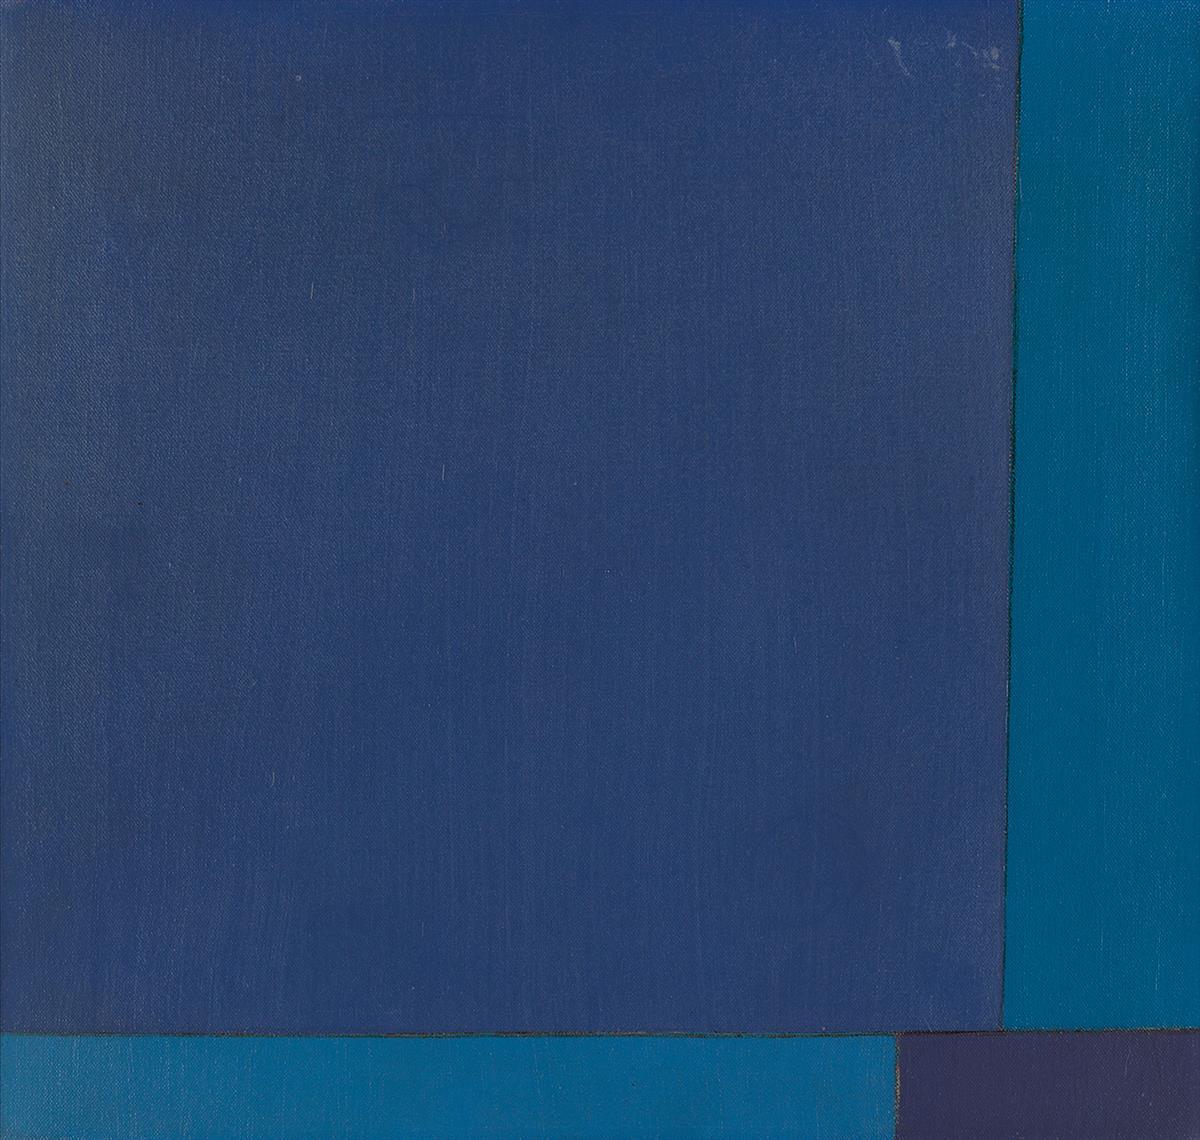 LUDWIG SANDER Blue.